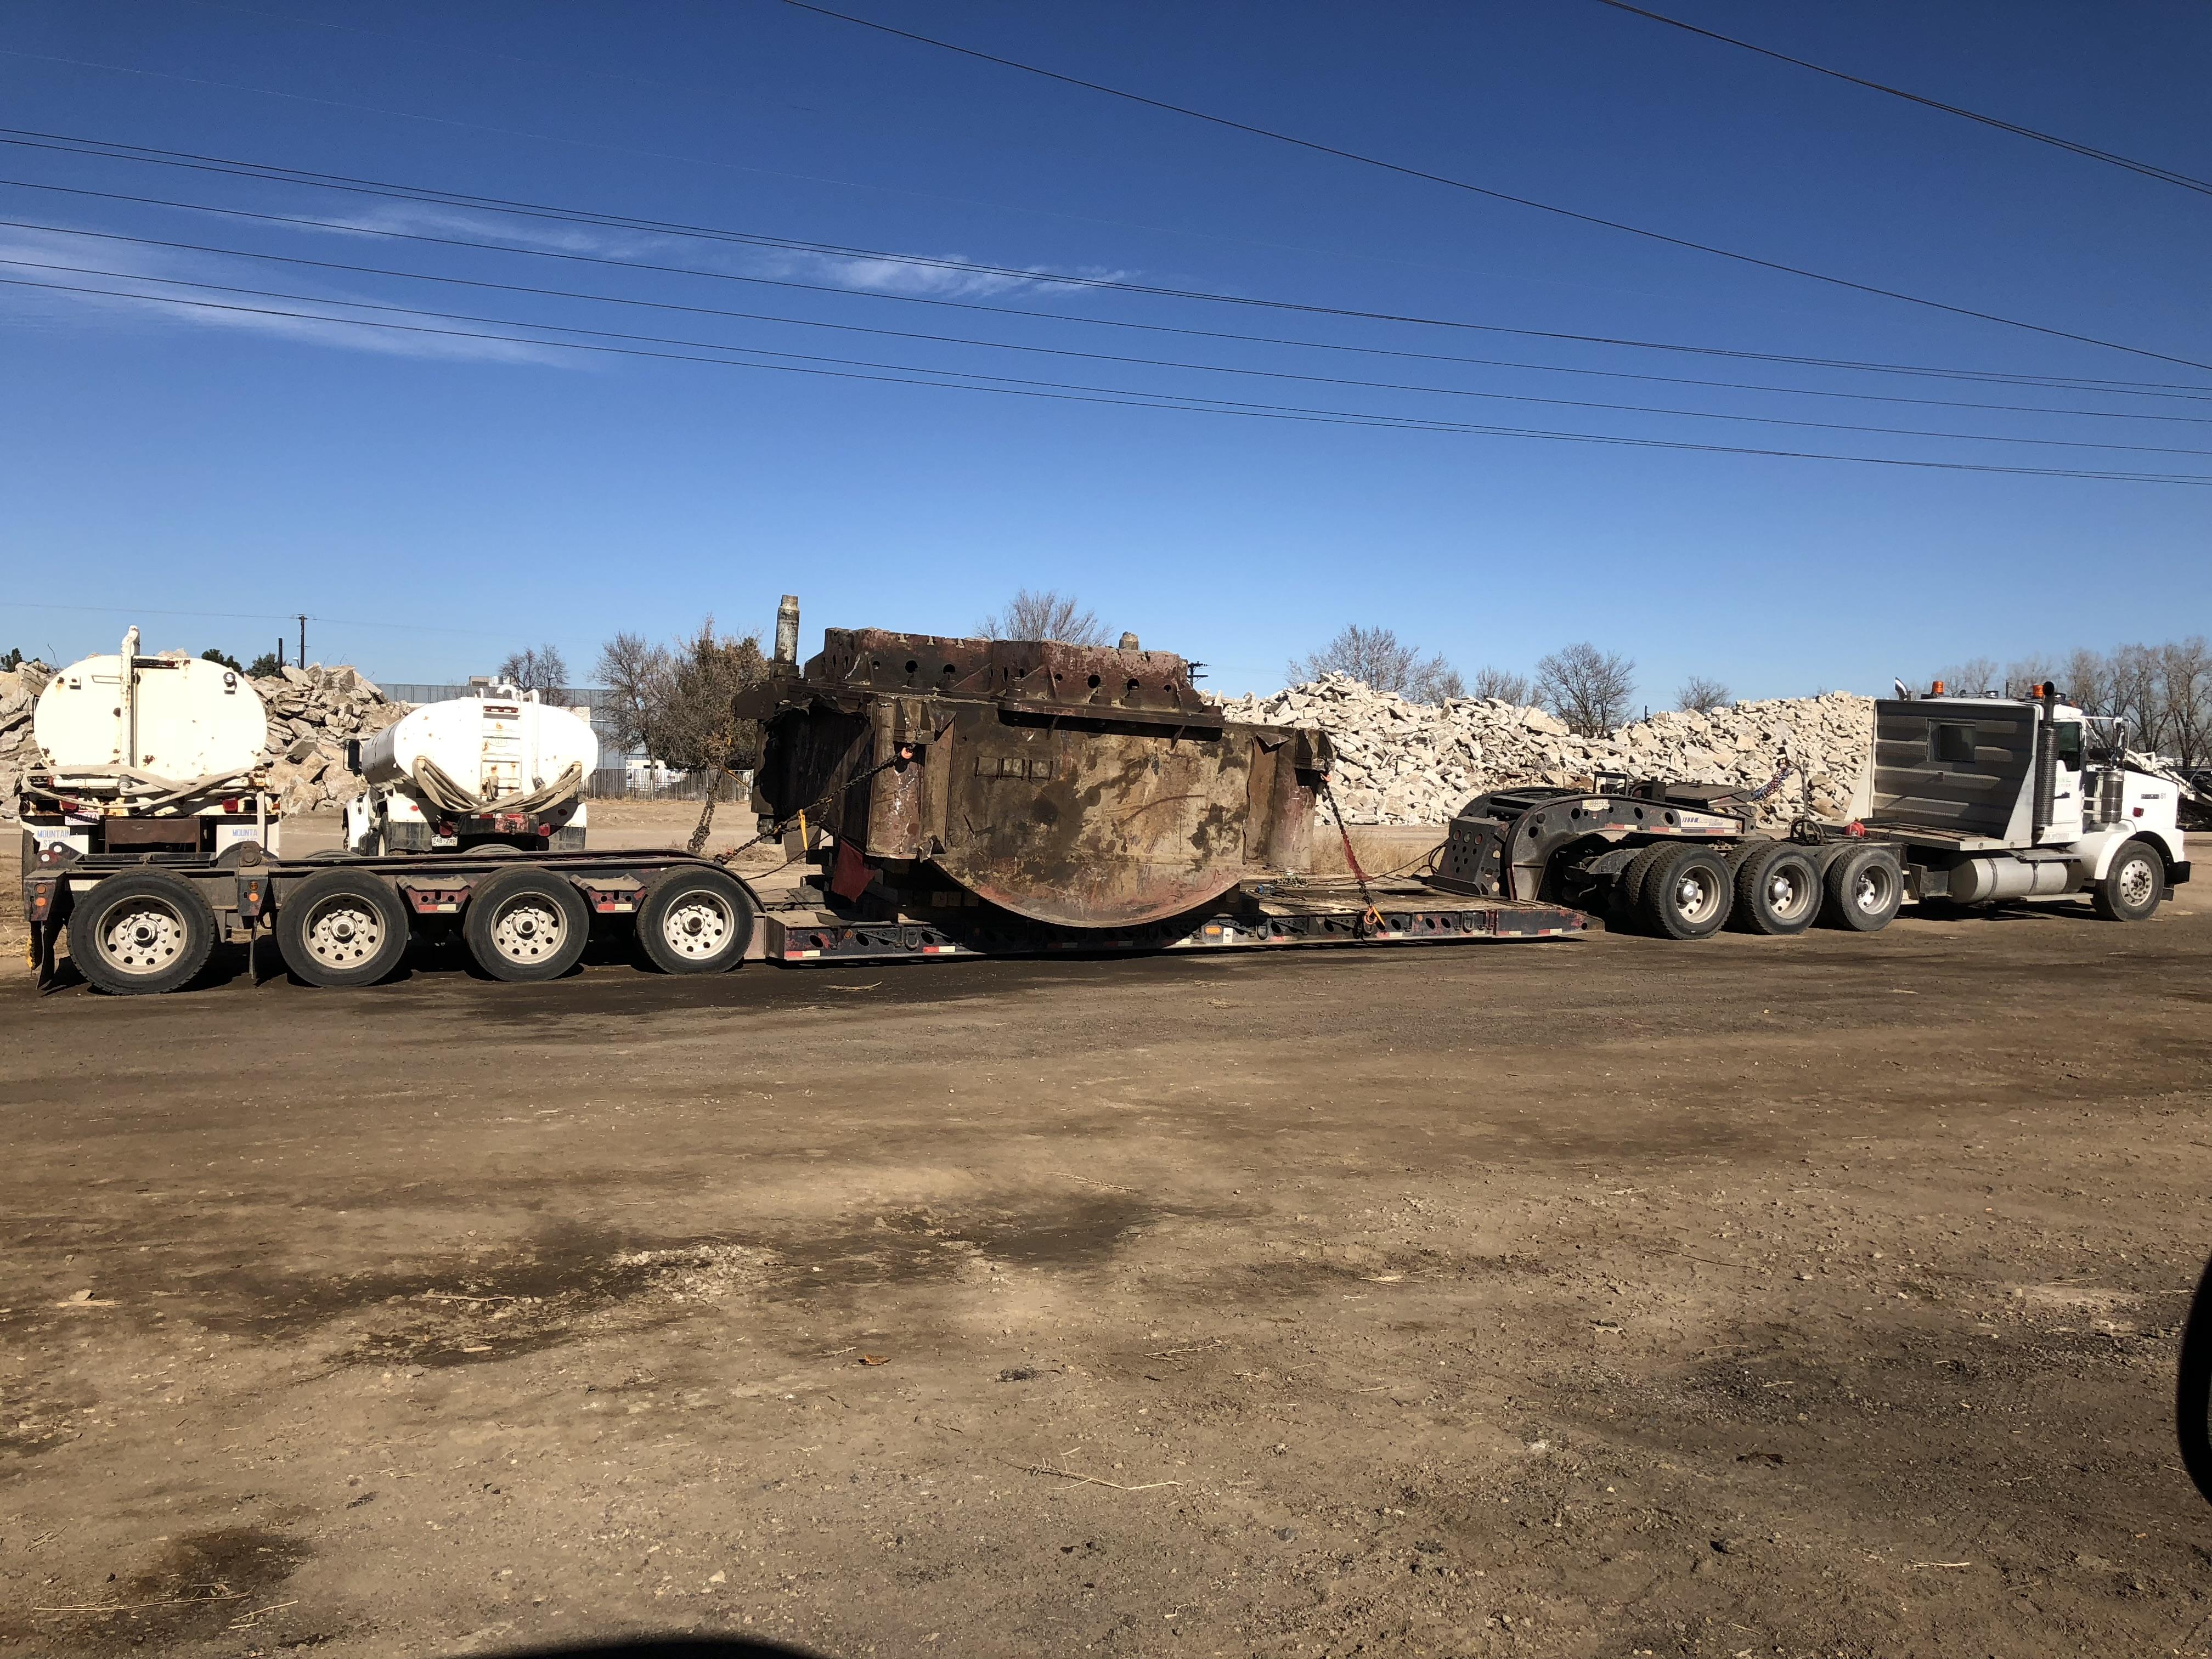 800 South Hoover Street Demolition, Longmont, Colorado - Alpine